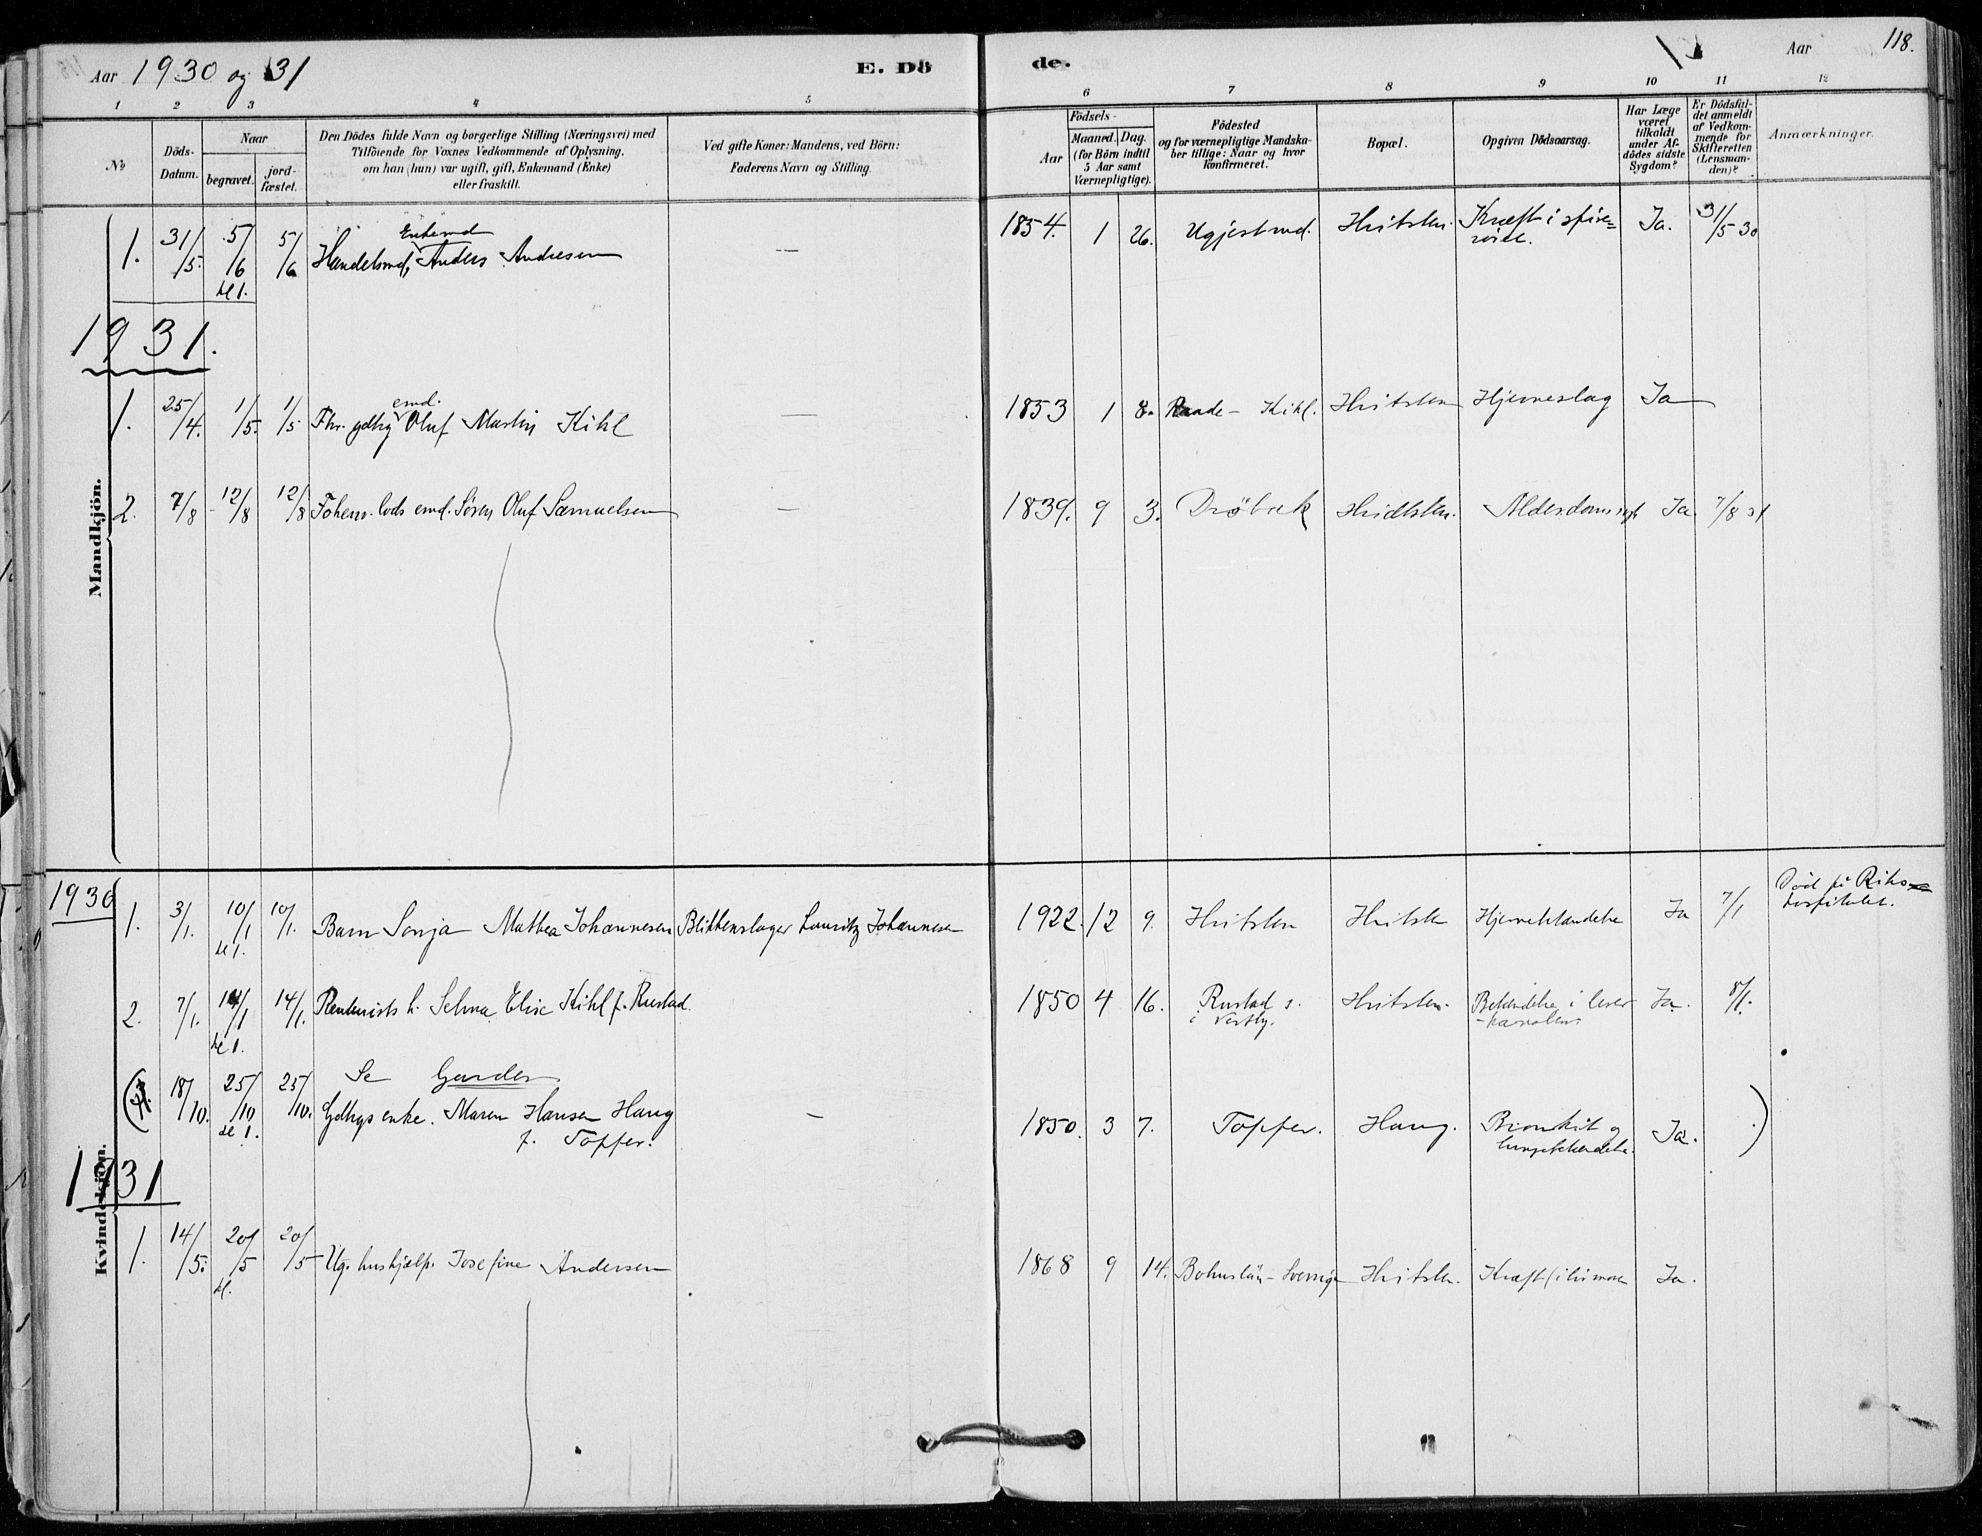 SAO, Vestby prestekontor Kirkebøker, F/Fd/L0001: Ministerialbok nr. IV 1, 1878-1945, s. 118